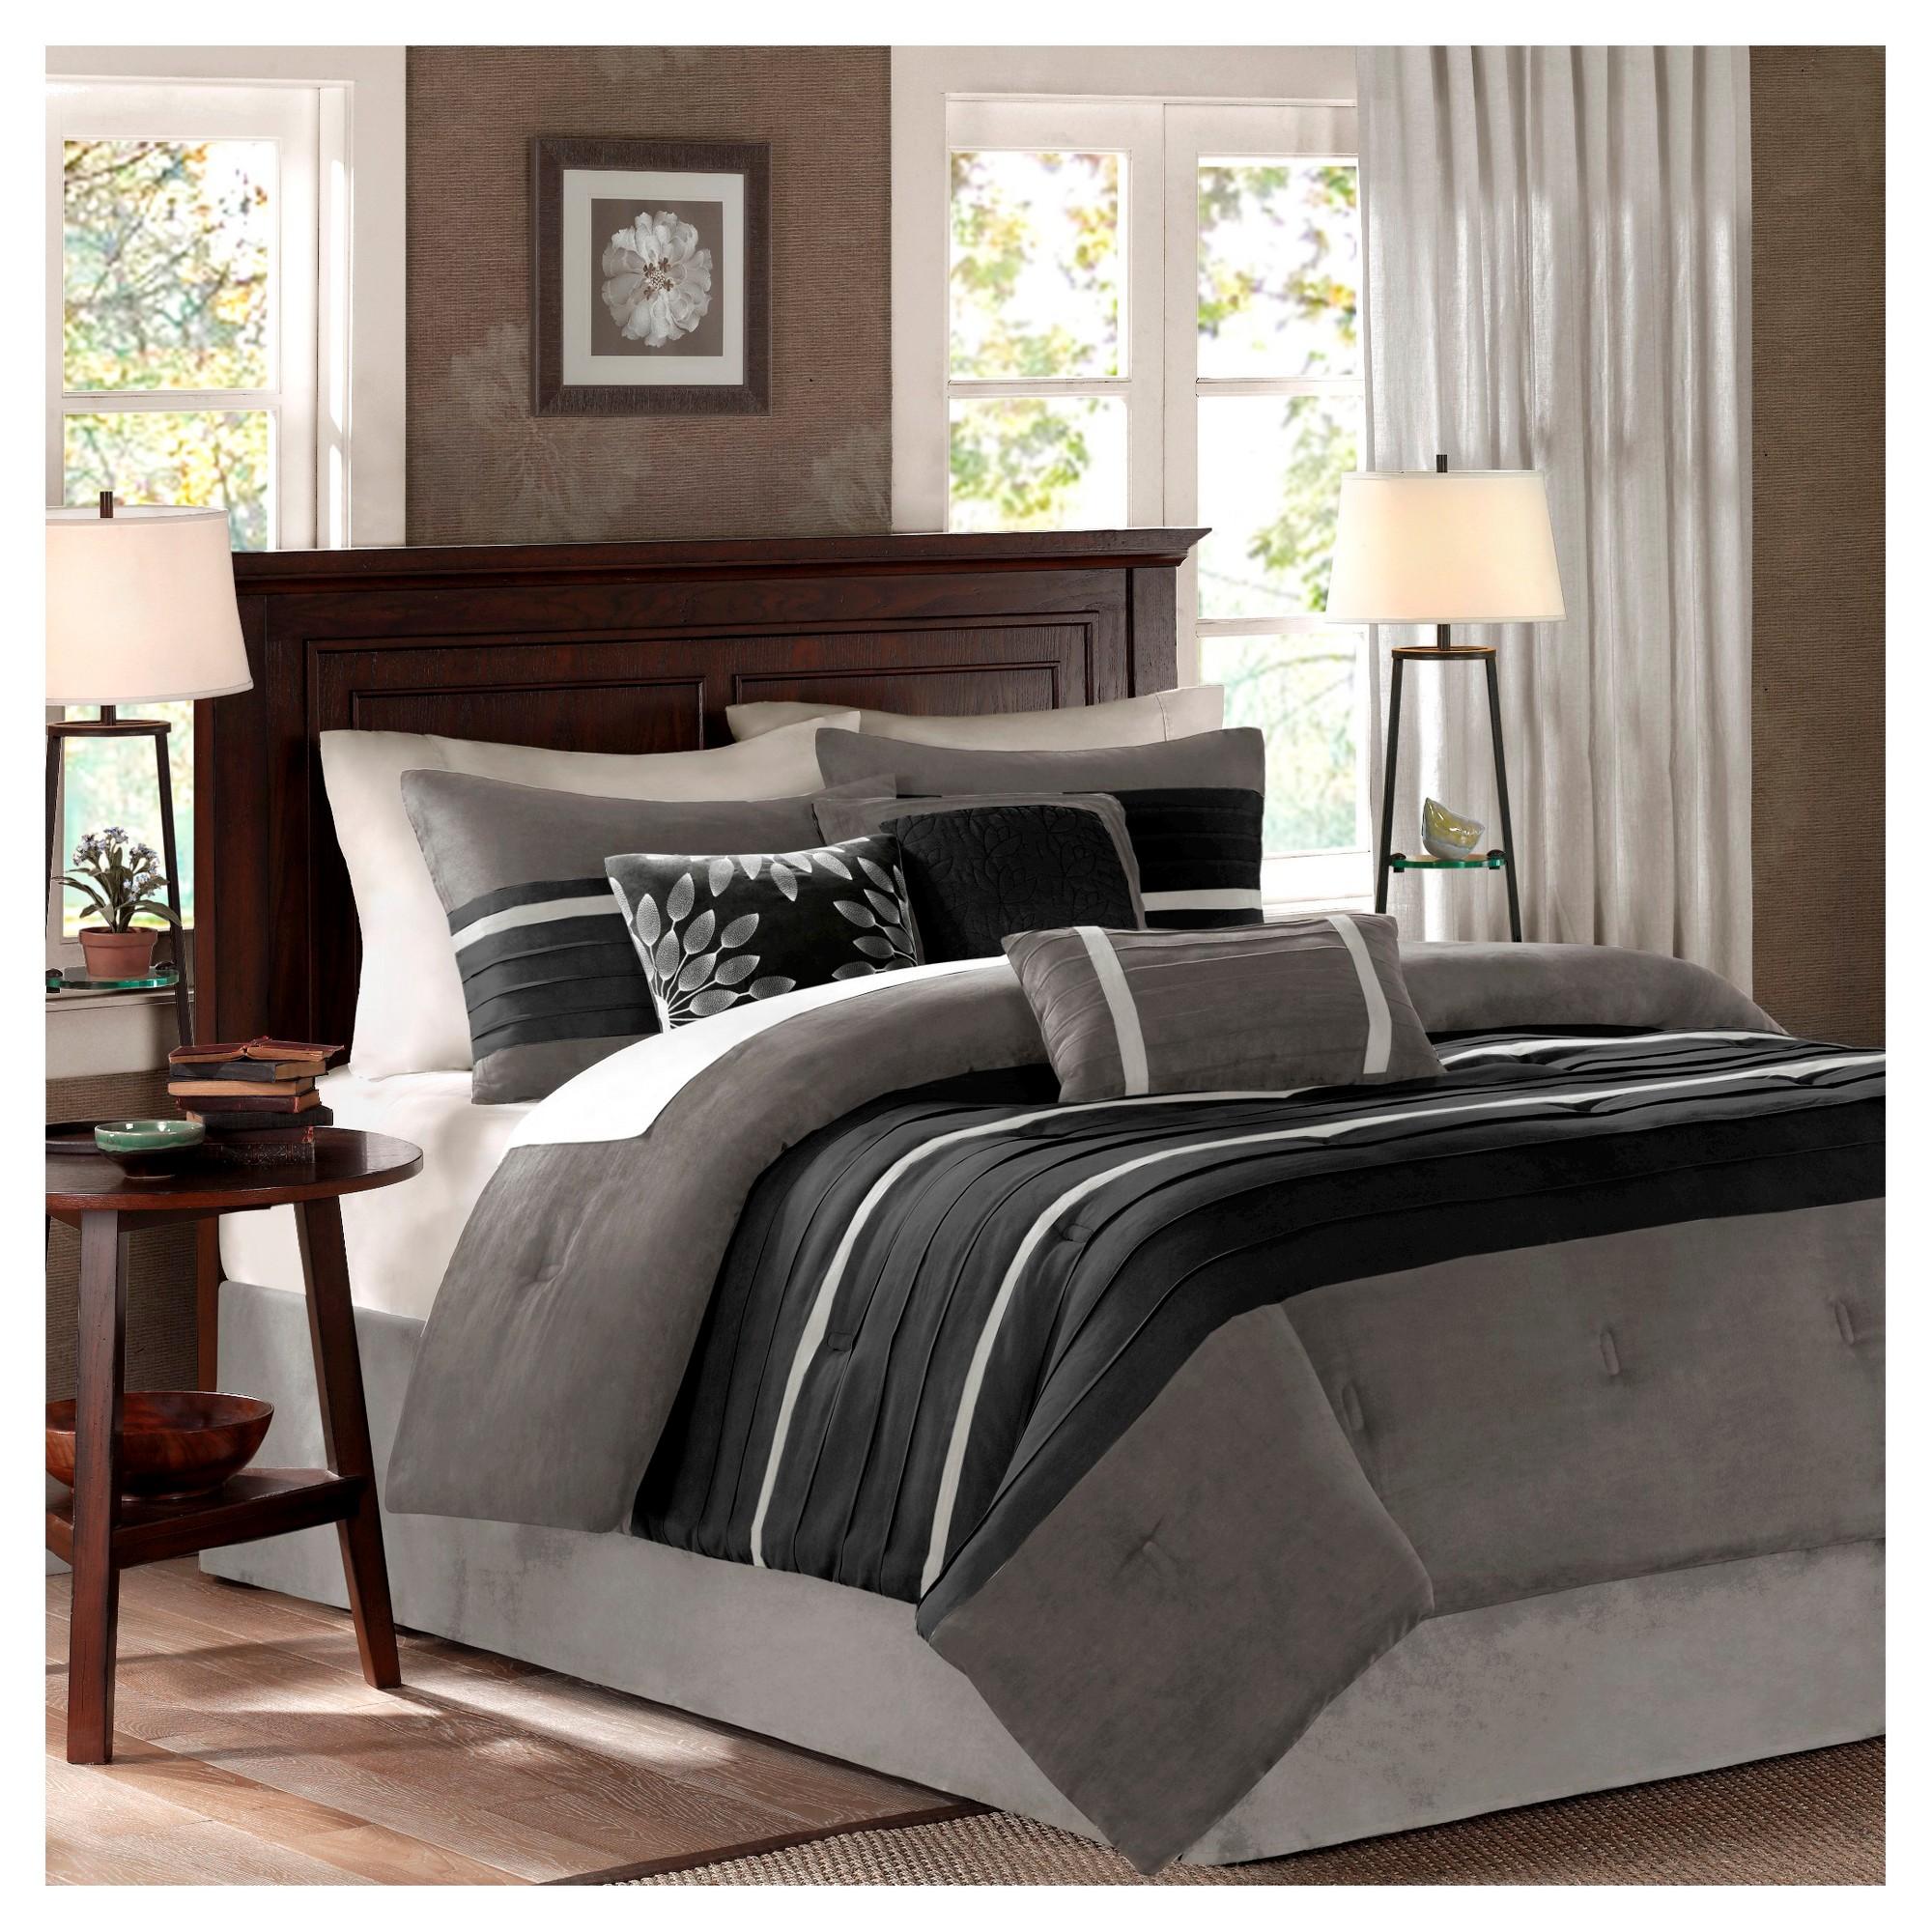 furnishings os madison comforter fl lodge highland highlandlodge creek bed microsuede collections bedding set